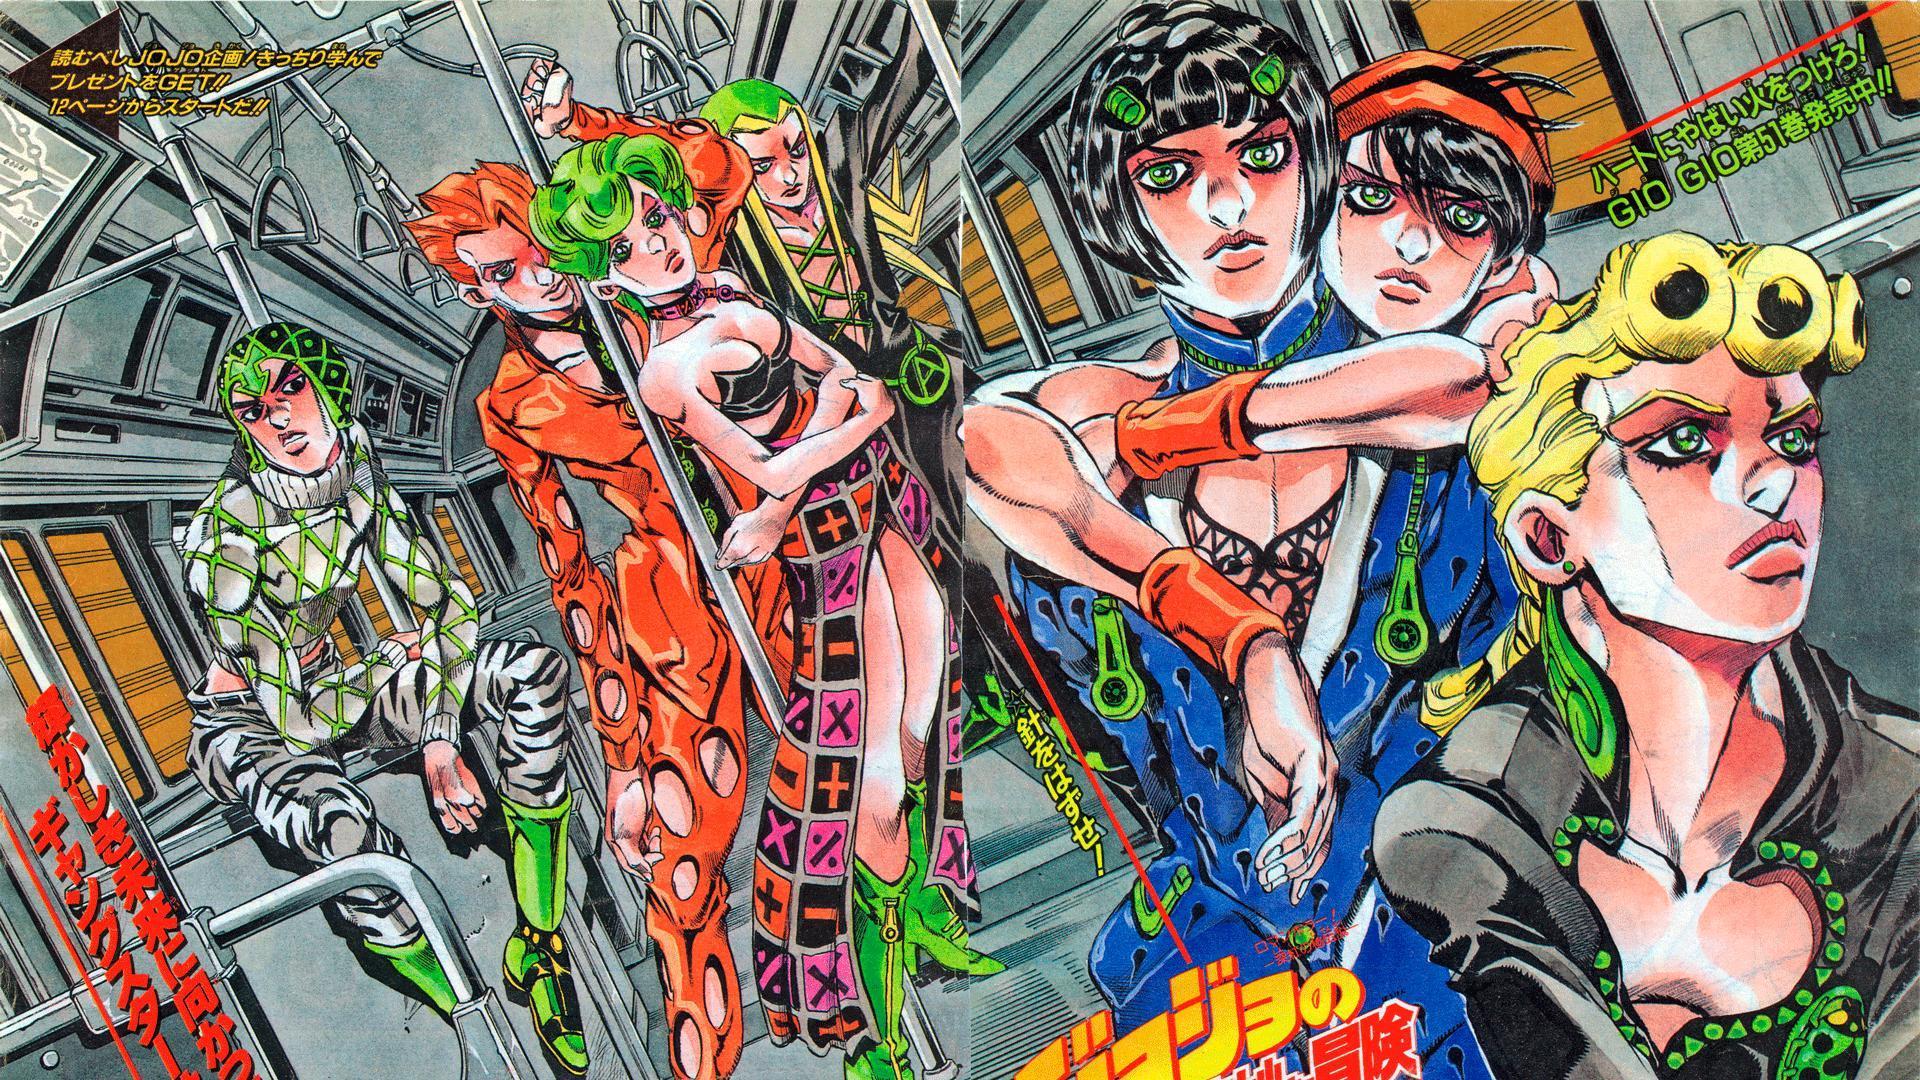 Jojo S Bizarre Adventure Wallpapers Top Free Jojo S Bizarre